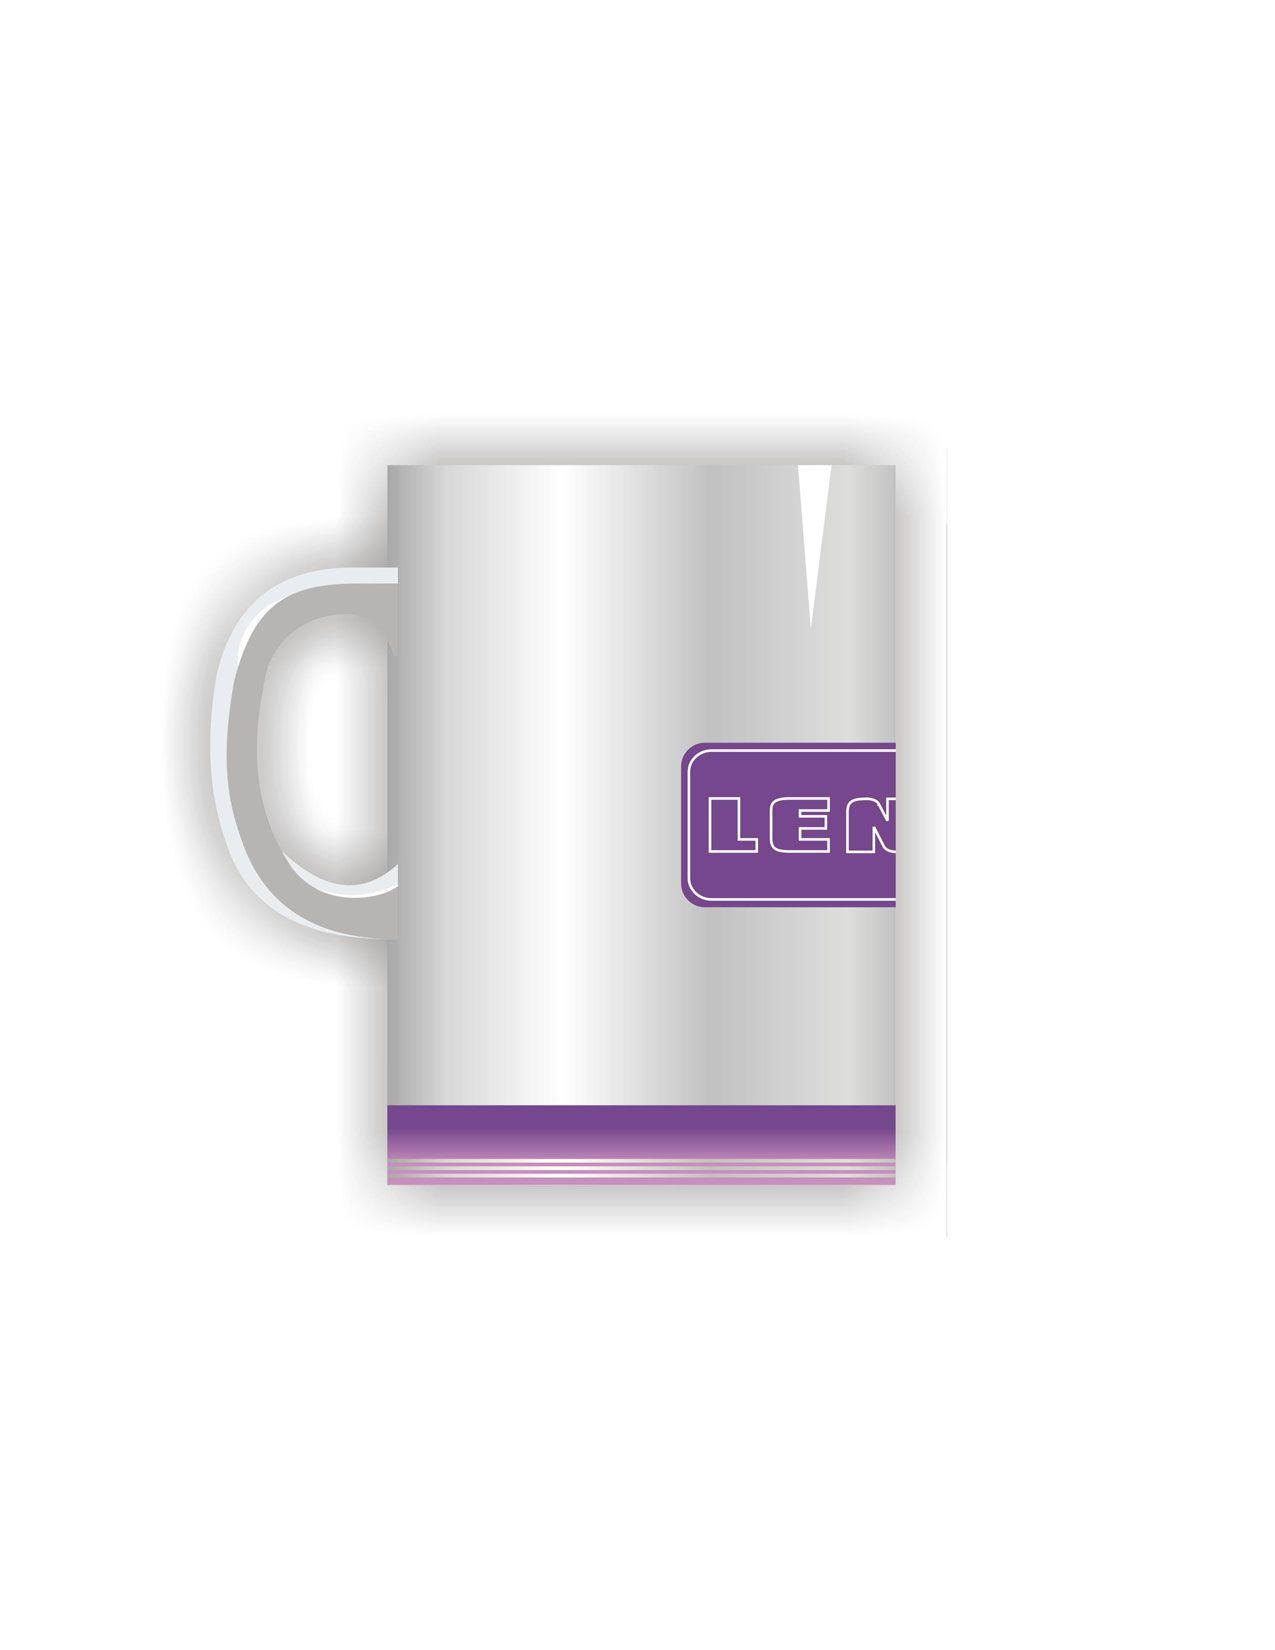 Доработка логотипа Курьерской службы - дизайнер kabo_flasher